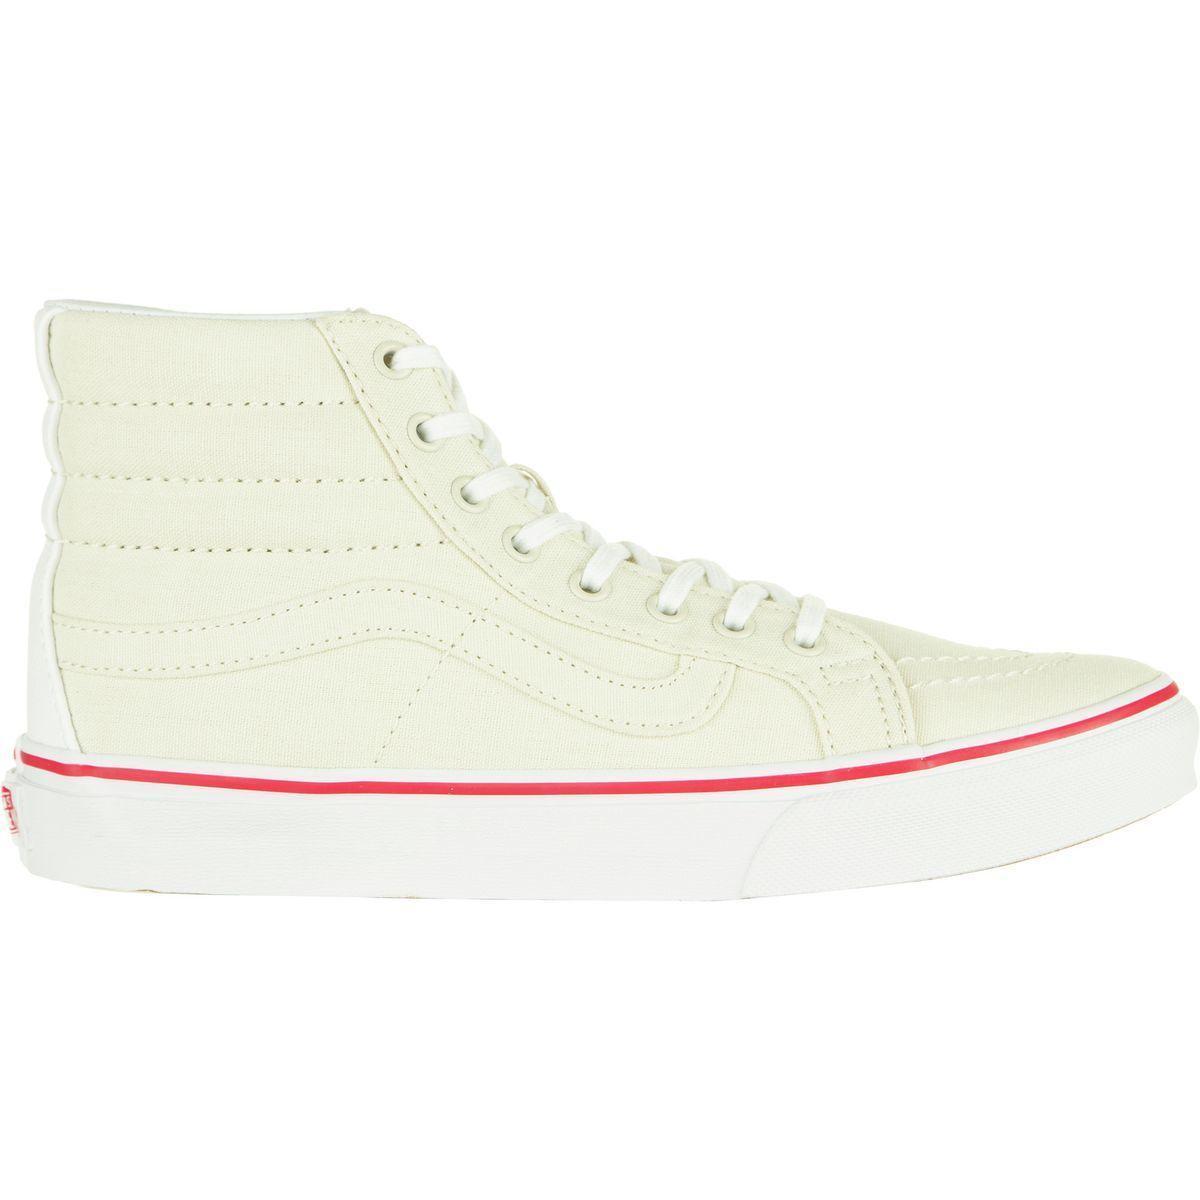 Vans  Vulc Hi Skate Shoe Black